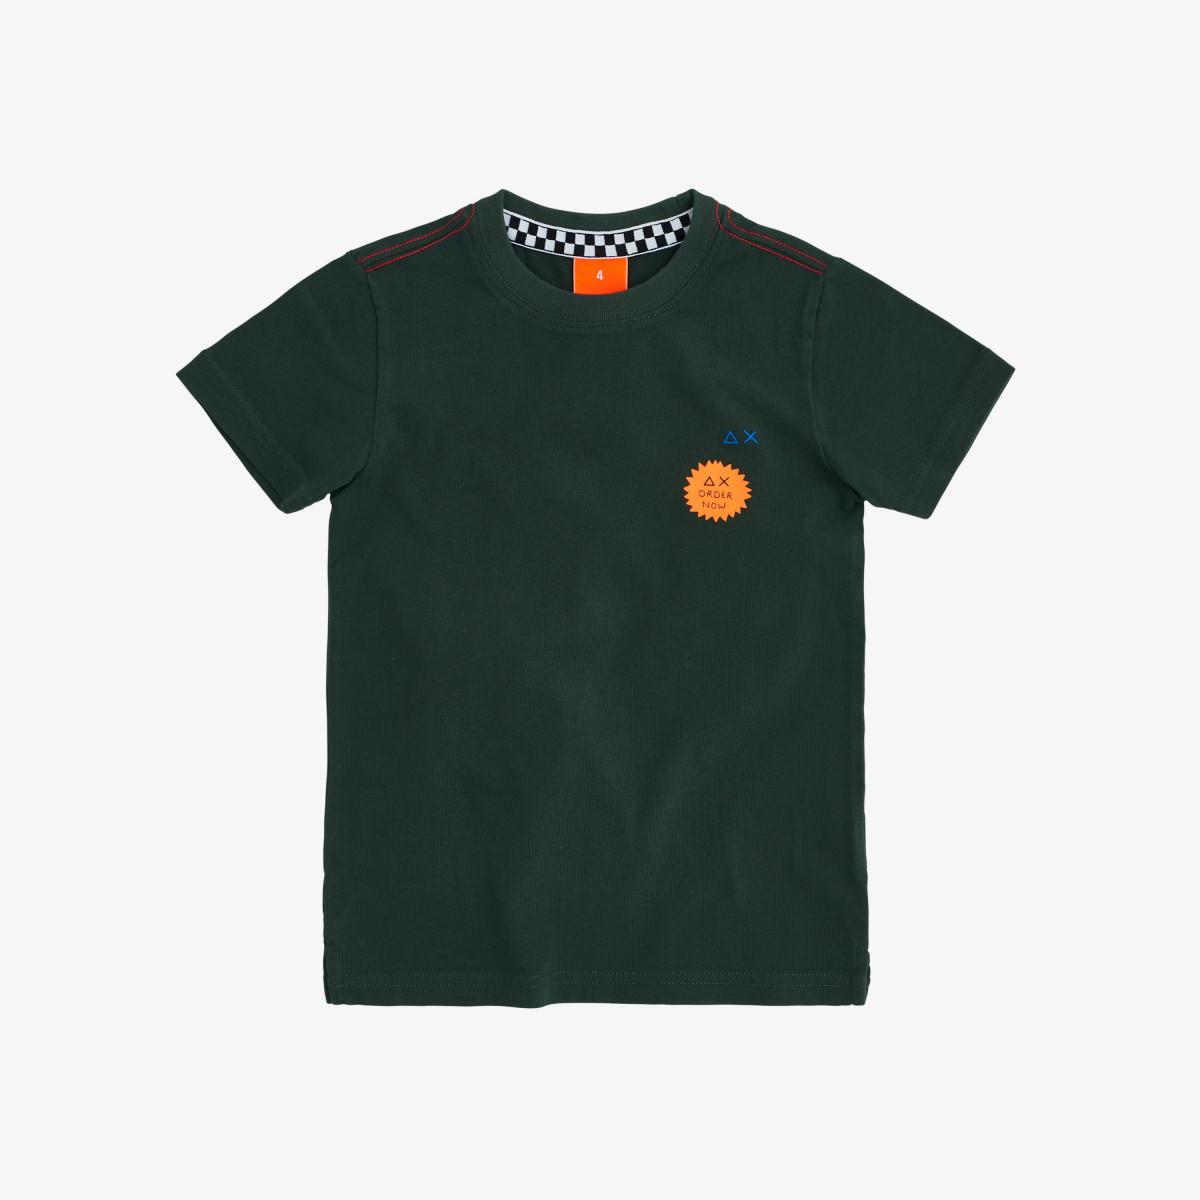 BOY'S T-SHIRT PATCH S/S DARK GREEN